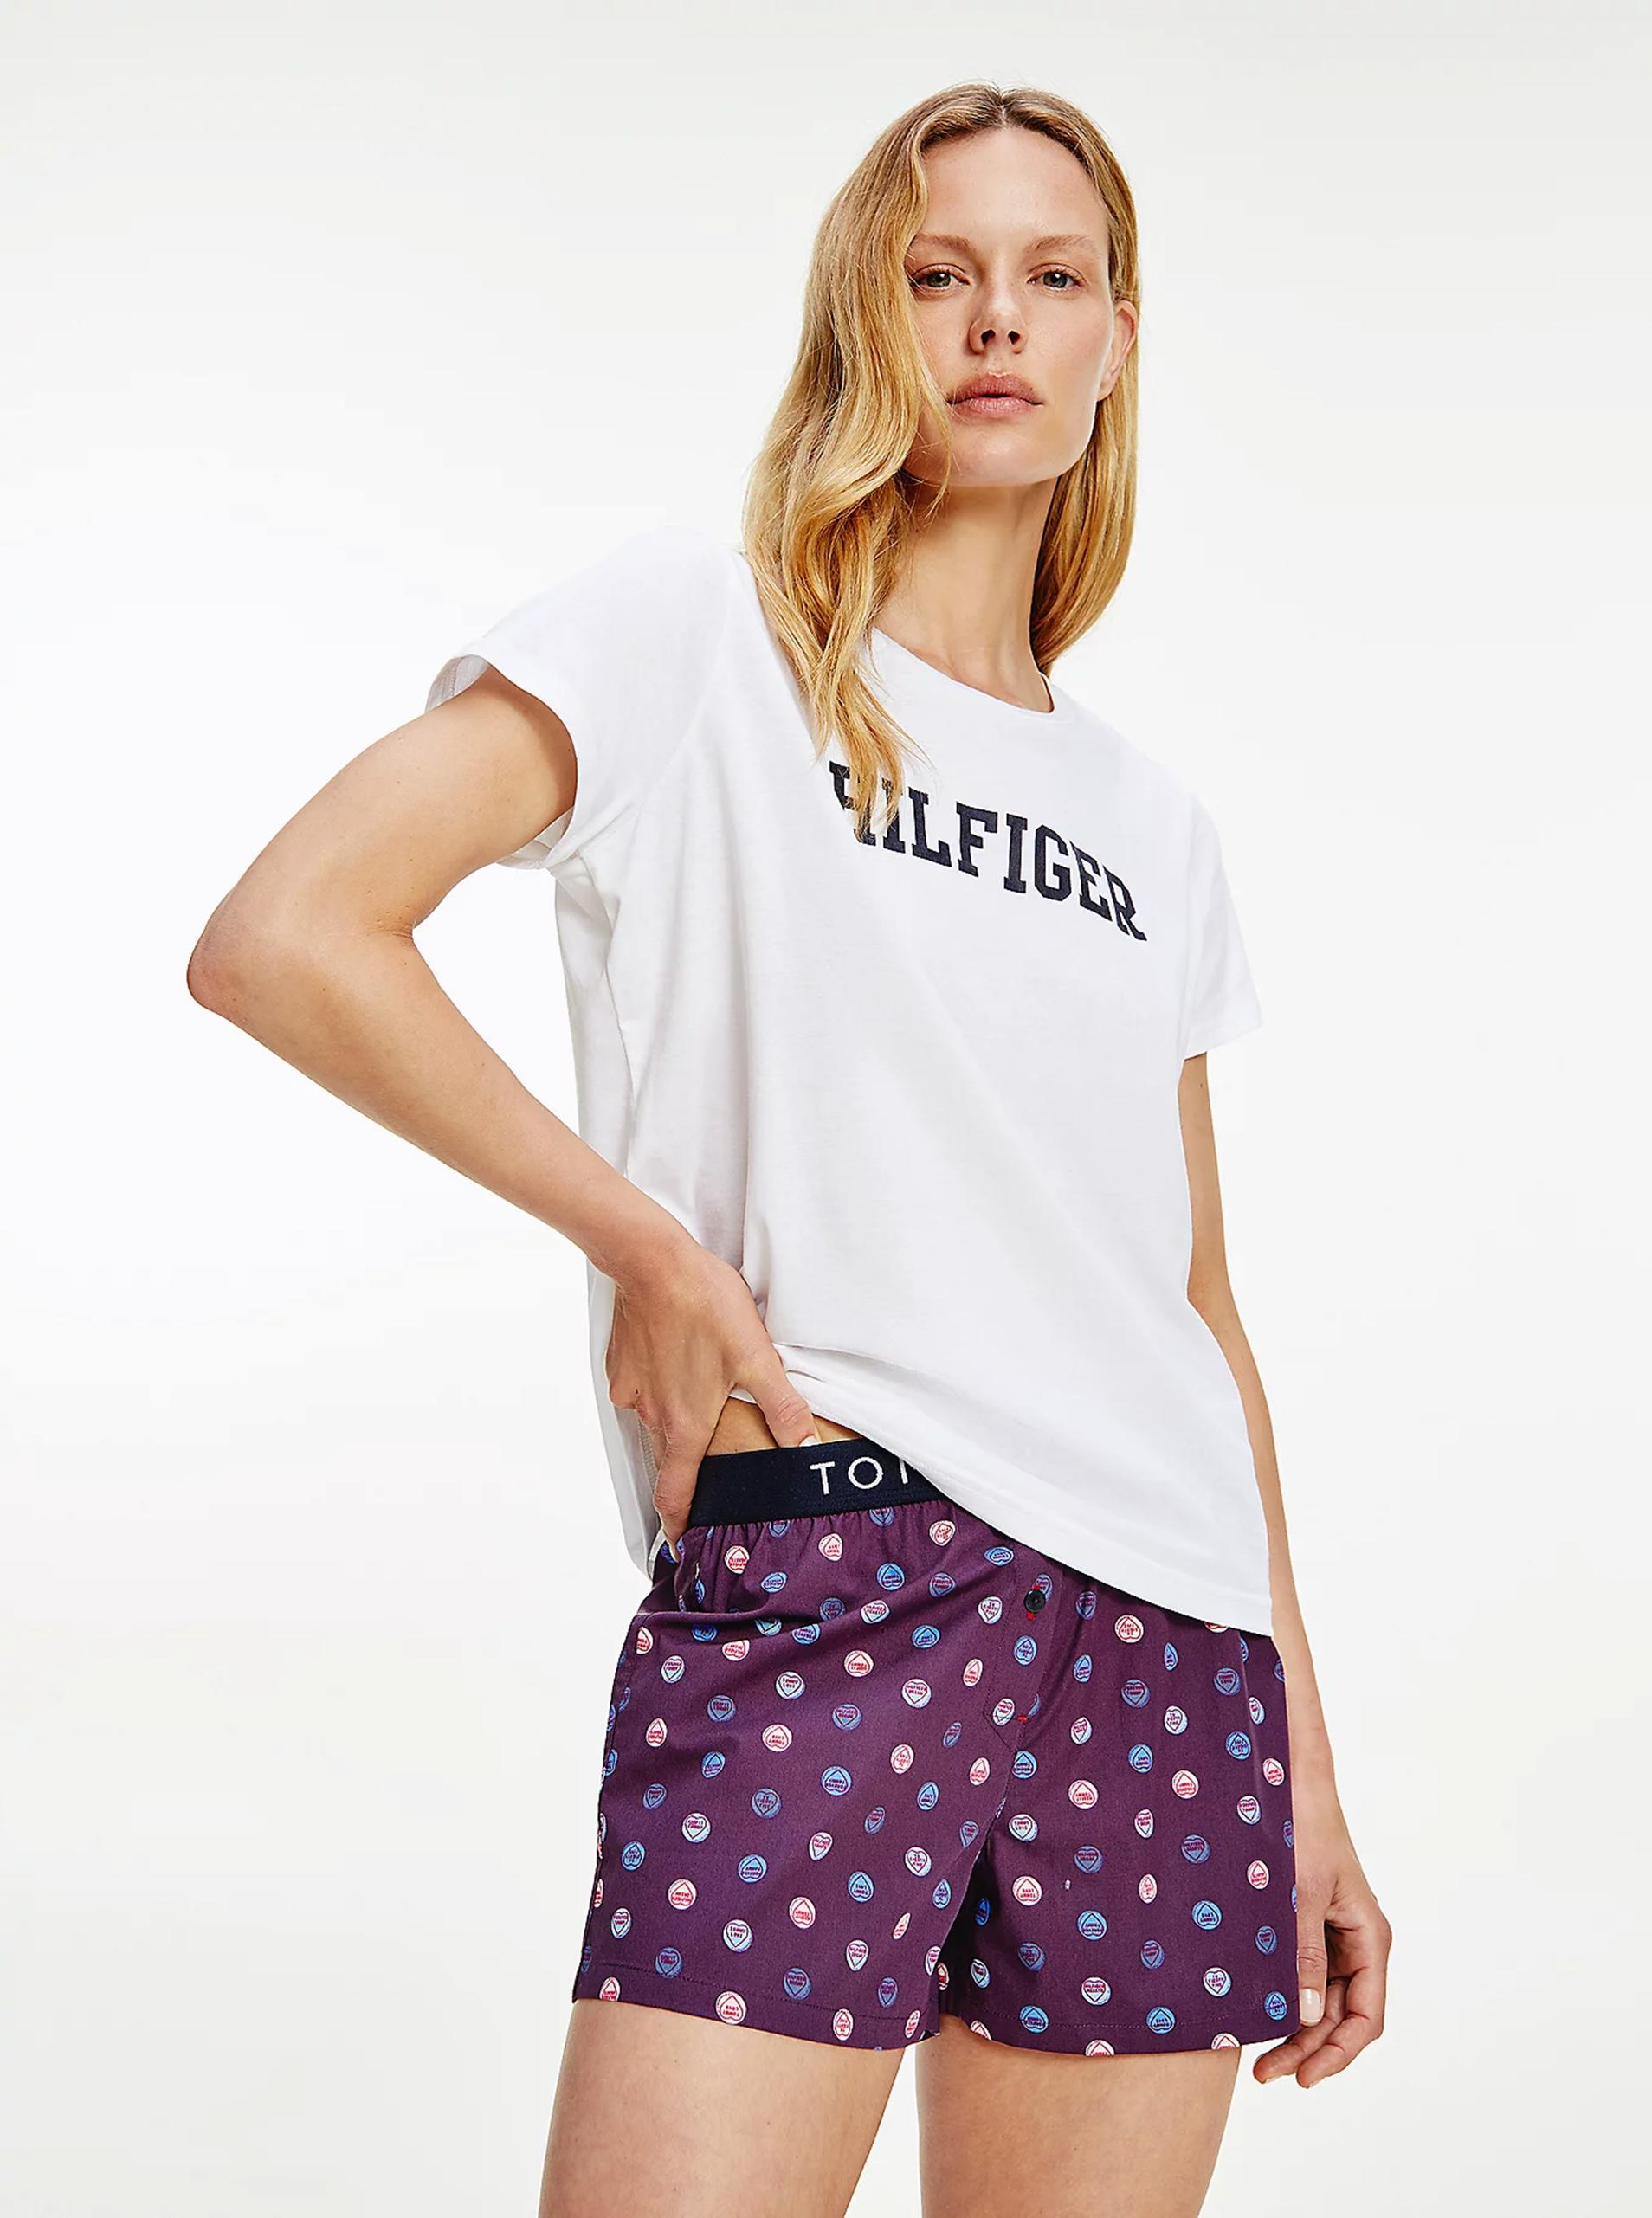 Tommy Hilfiger bianco maglietta con logo